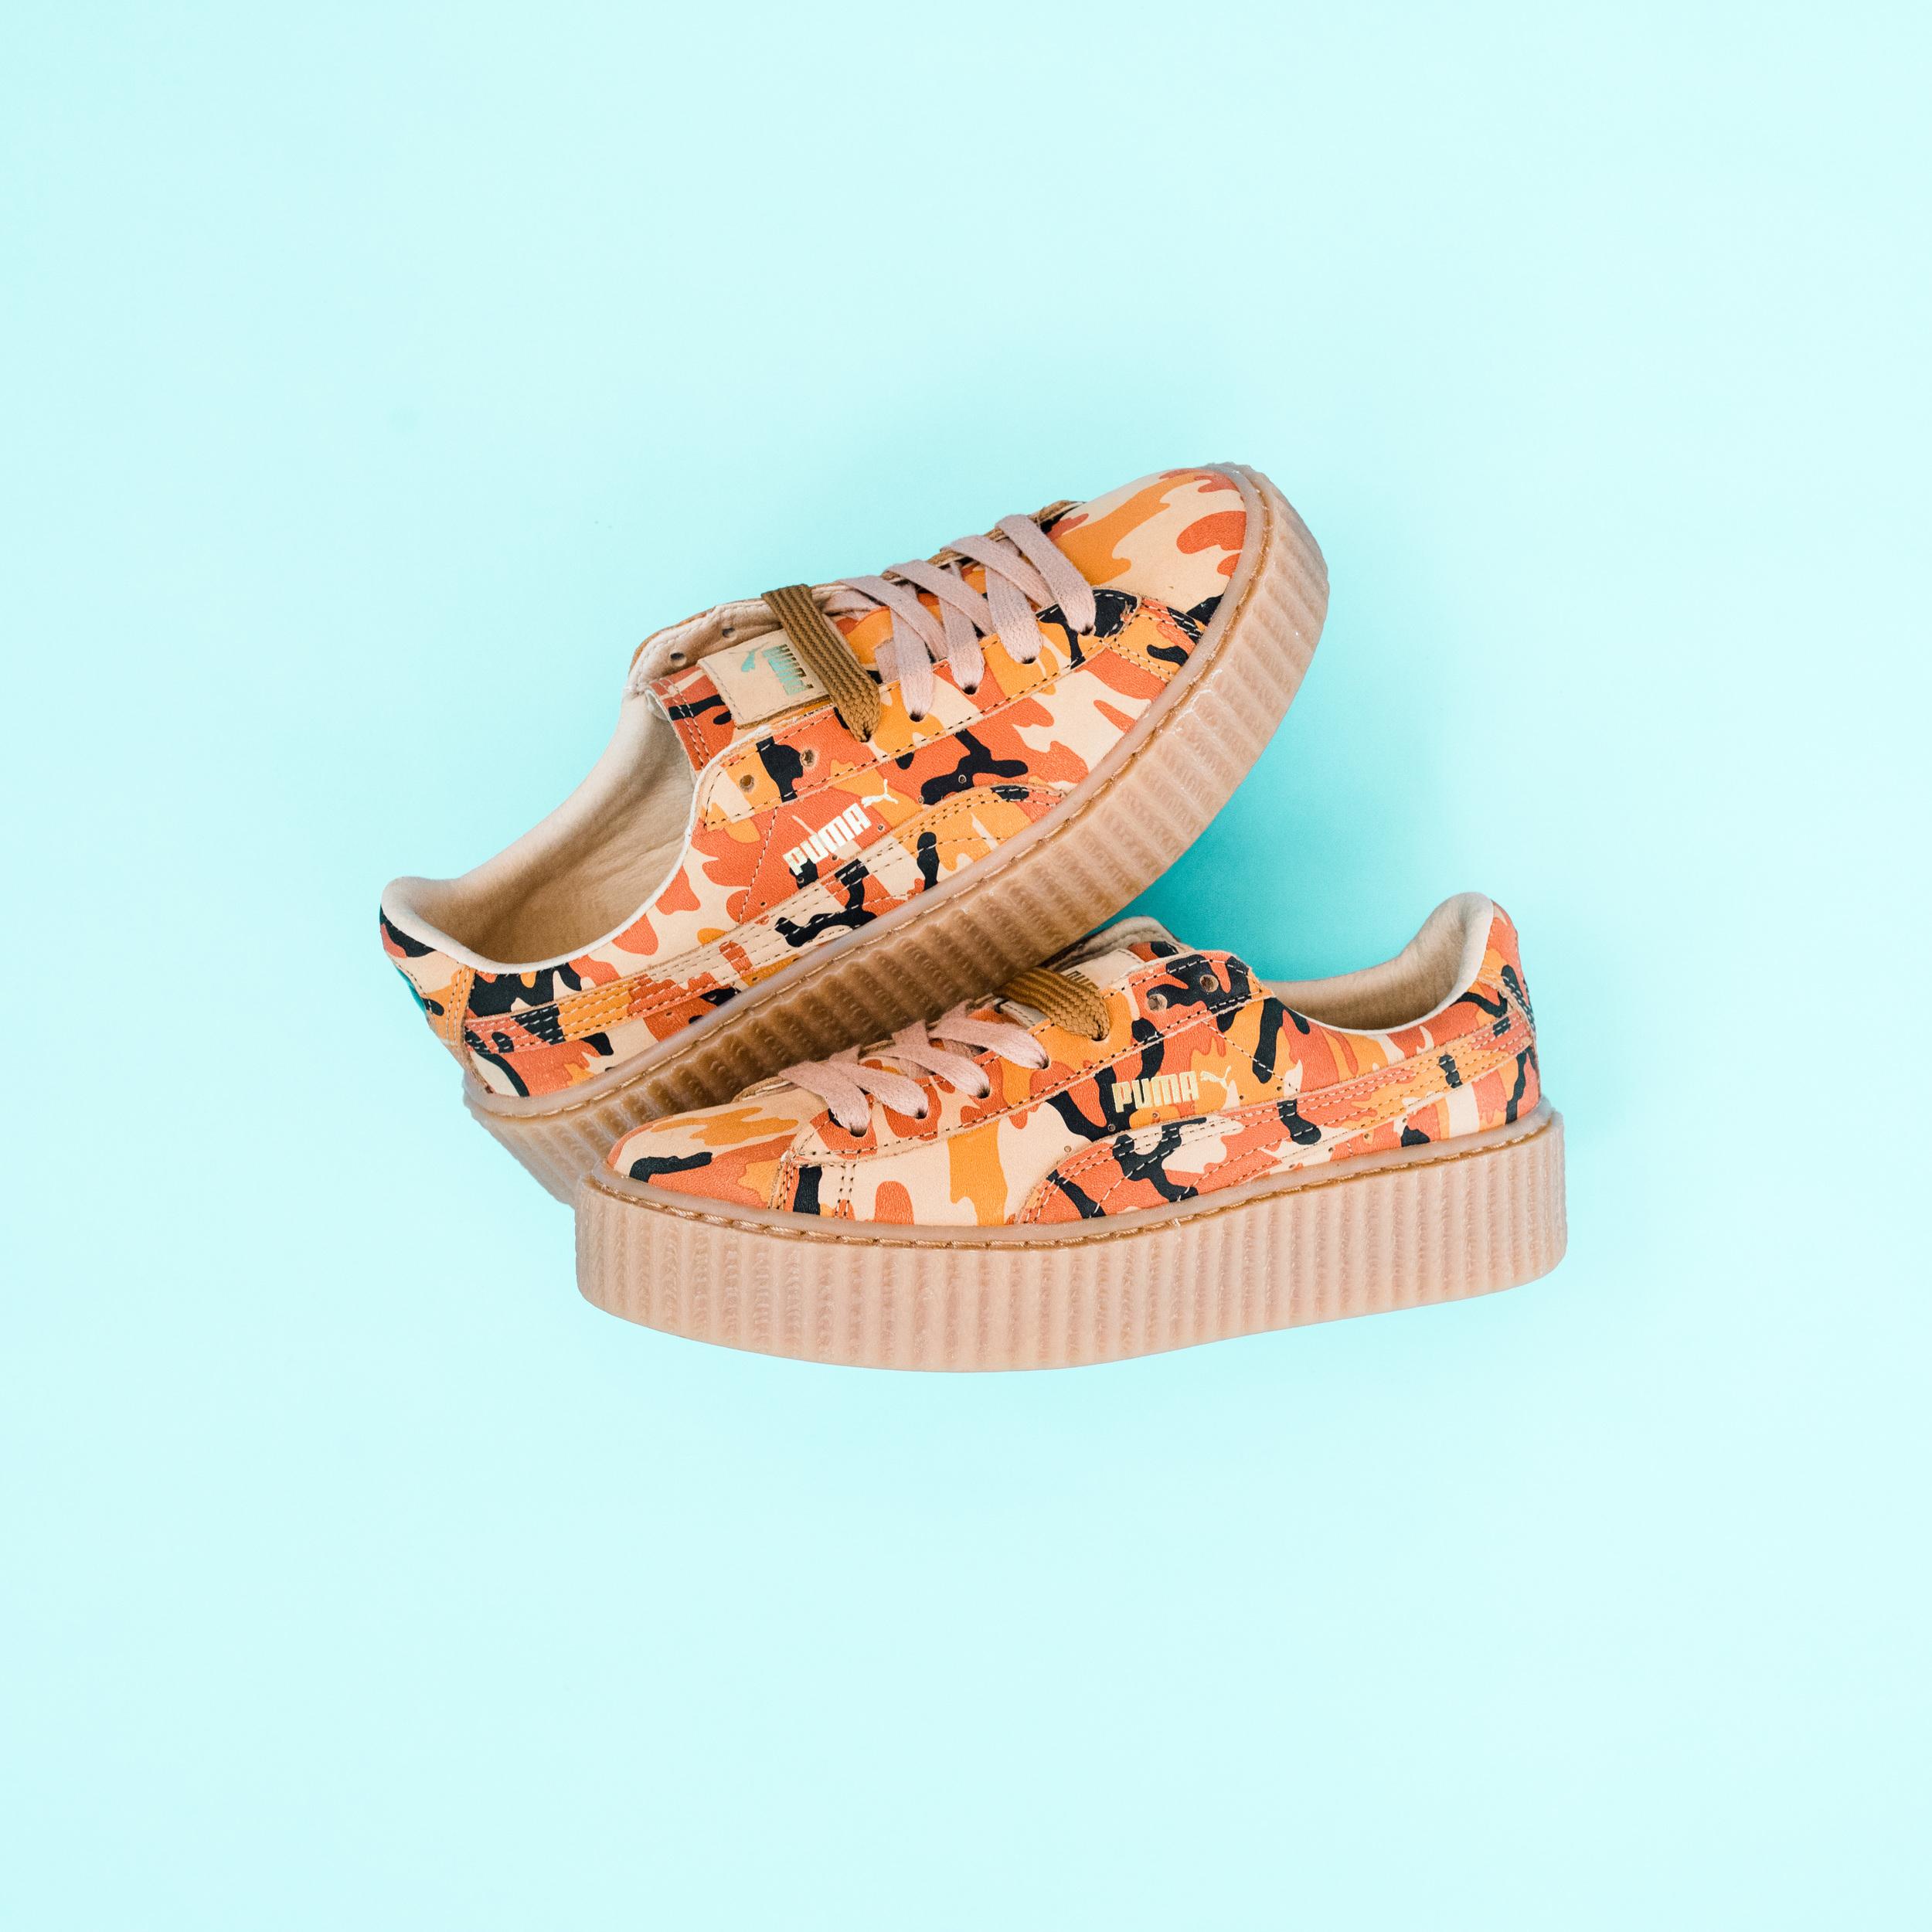 new style ab506 613d3 Now Available: Puma FENTY Creeper by Rihanna